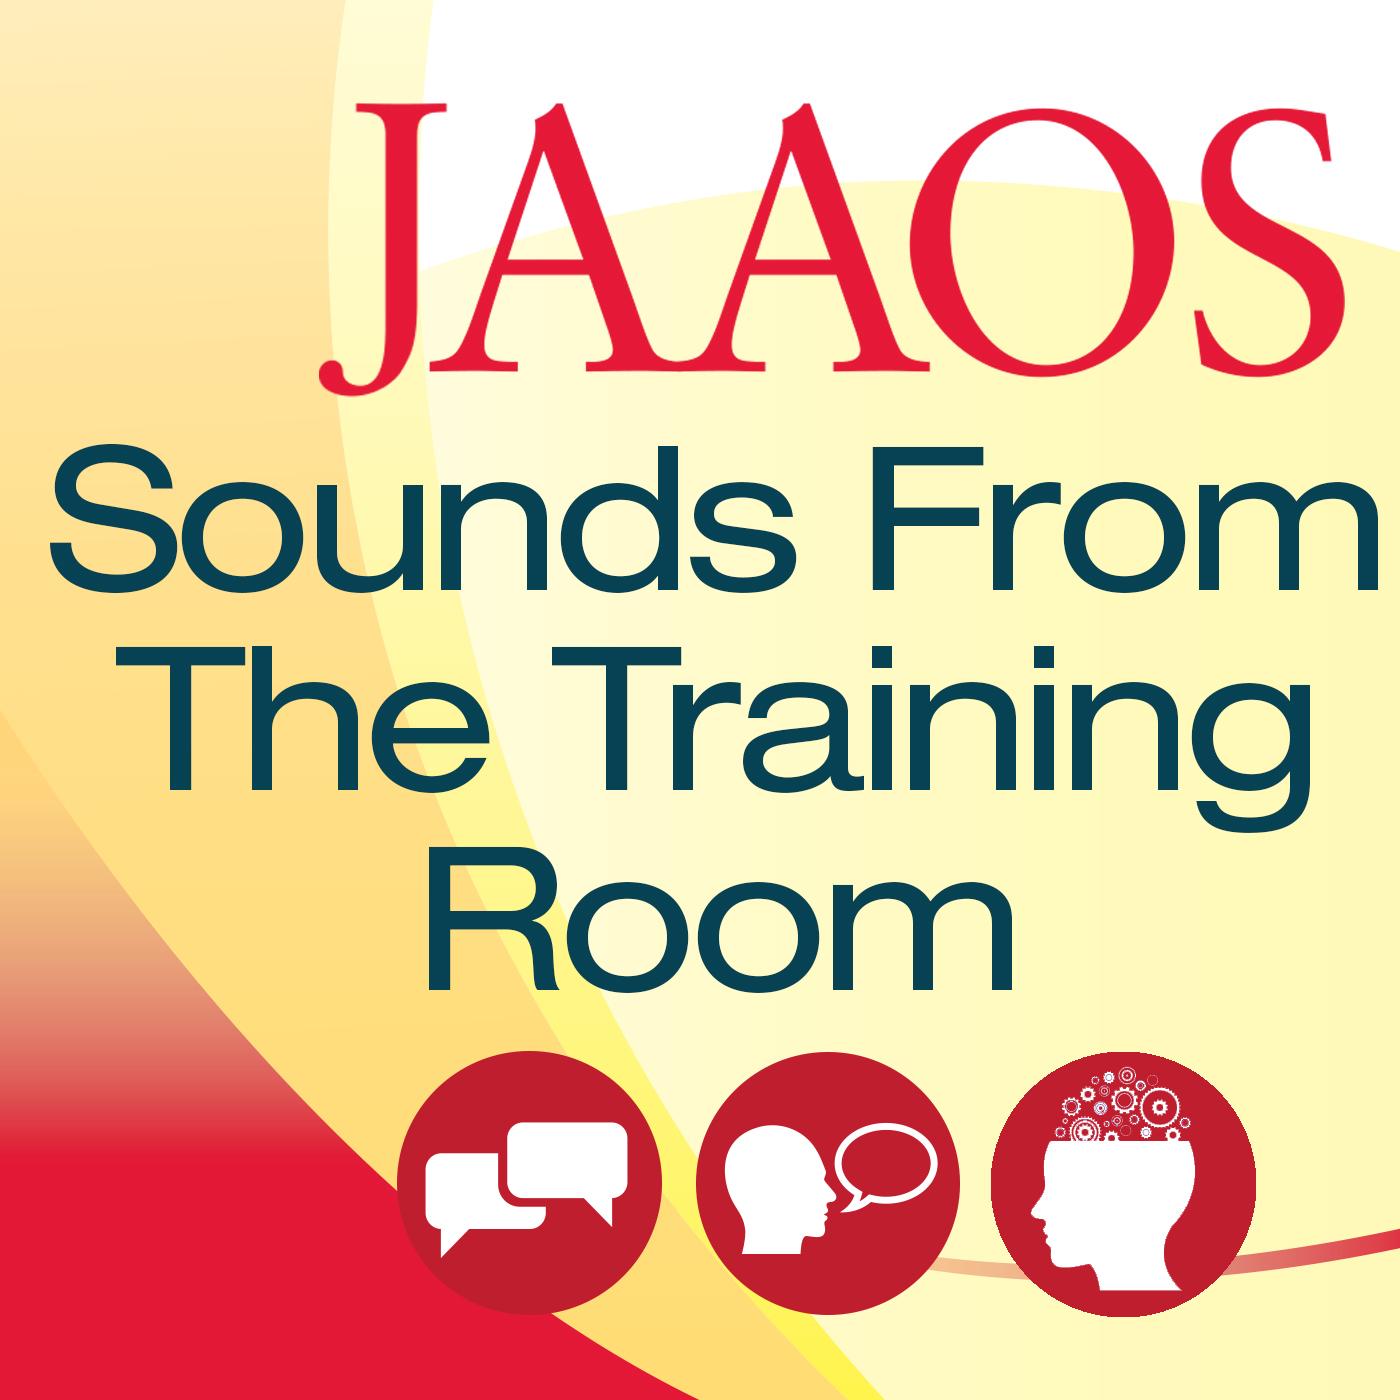 JAAOS - Journal of the American Academy of Orthopaedic Surgeons